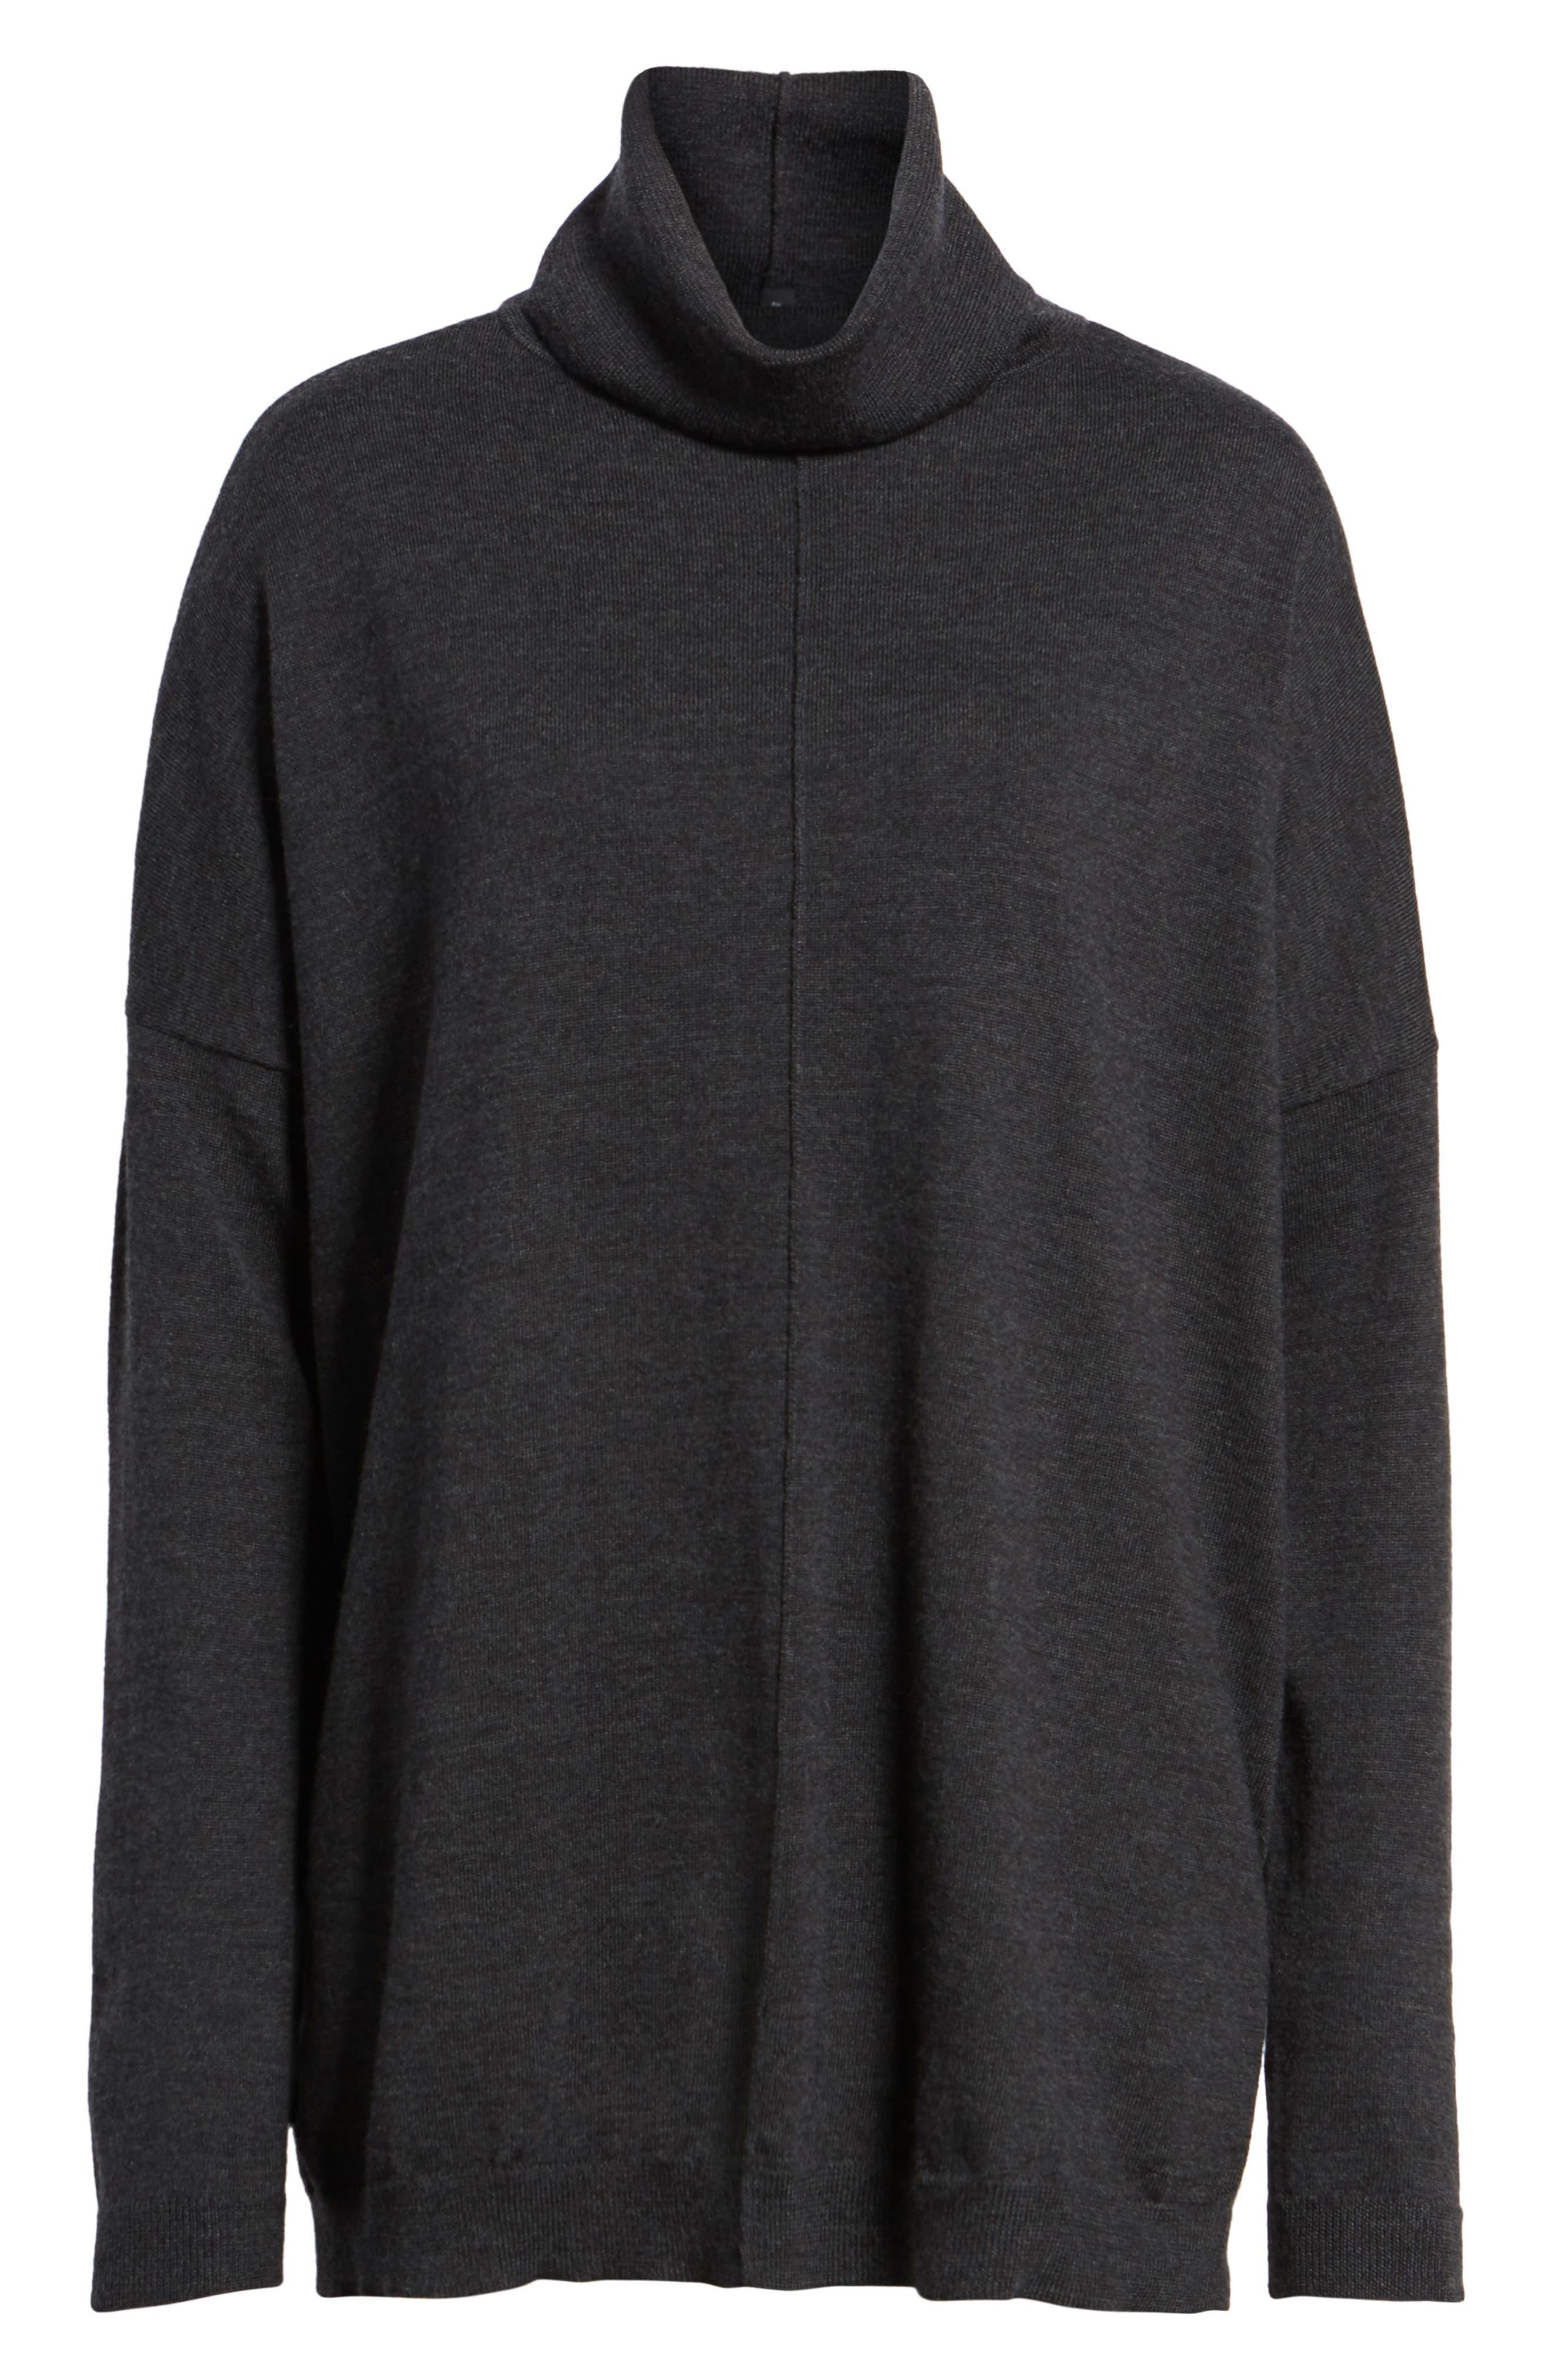 Merino Wool Boxy Turtleneck Sweater,                             Alternate thumbnail 6, color,                             021